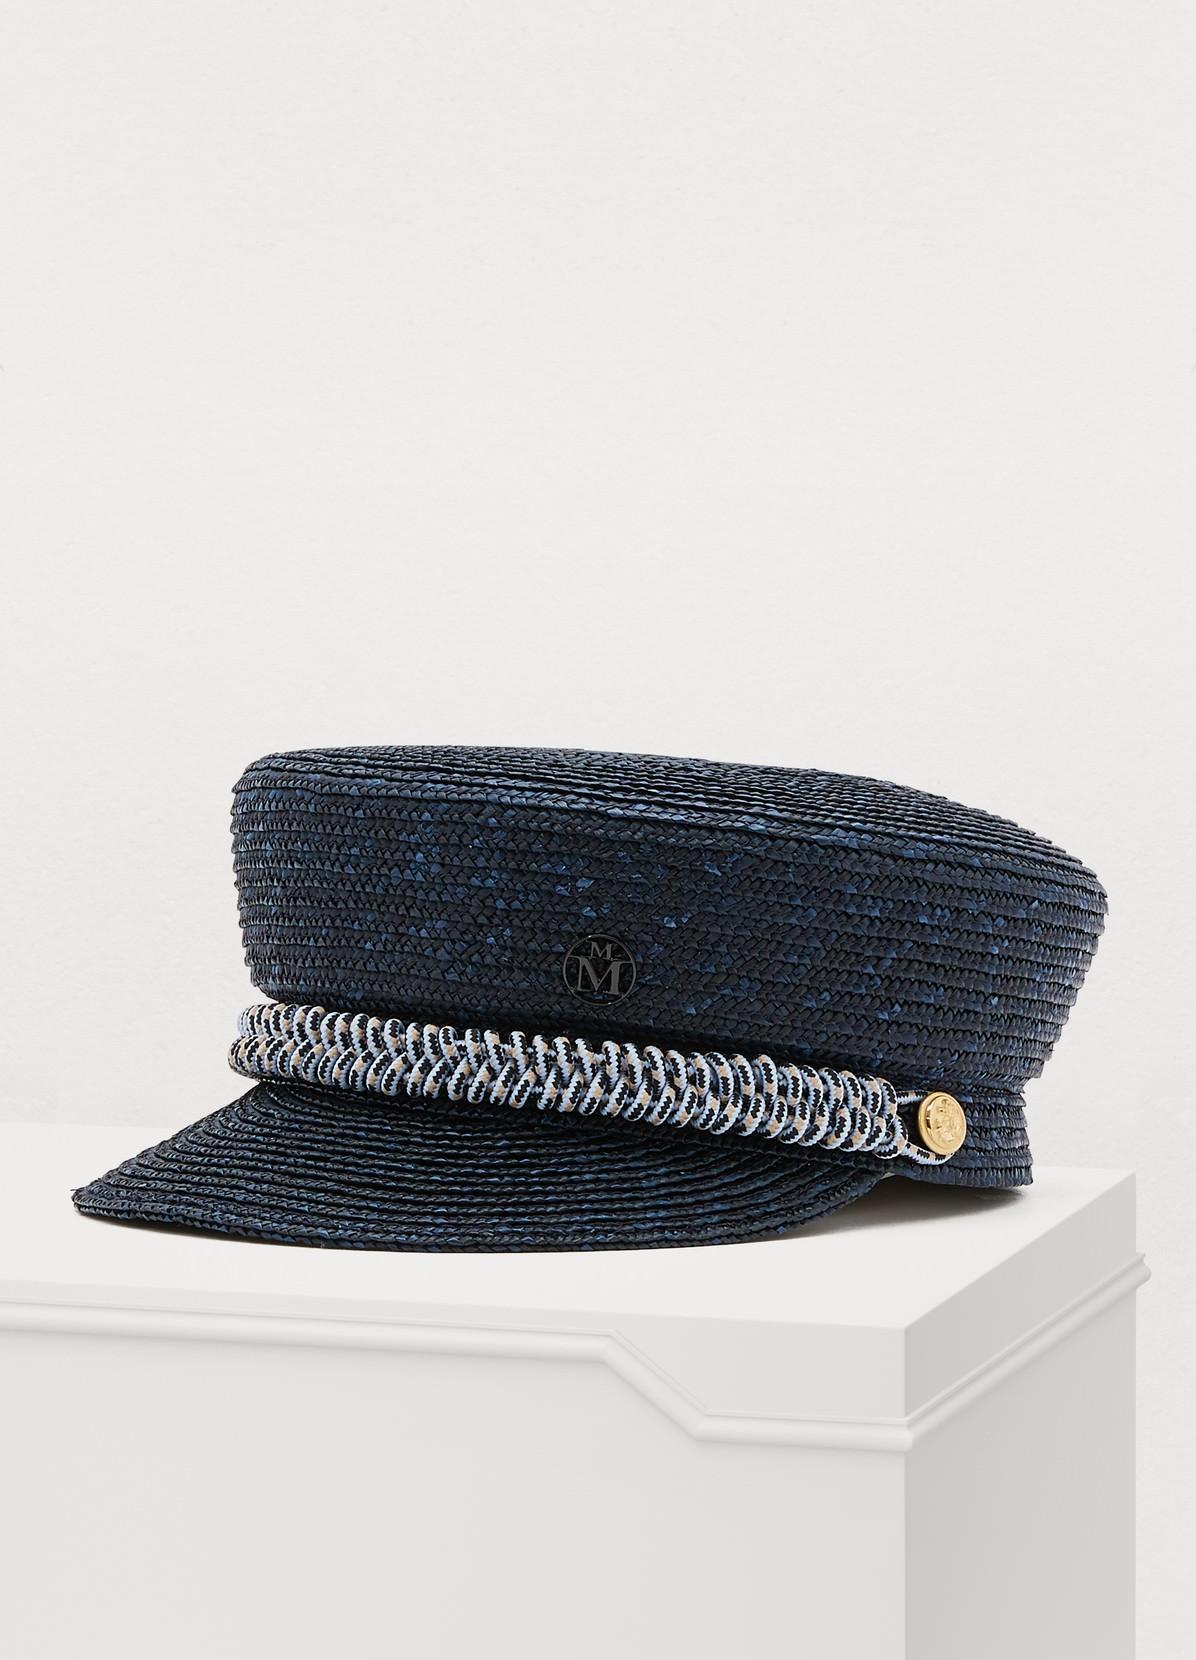 24S加拿大精品購物網站,八折折扣碼分享,超喜歡這頂STELLA MC CARTNEY Logo 棒球帽